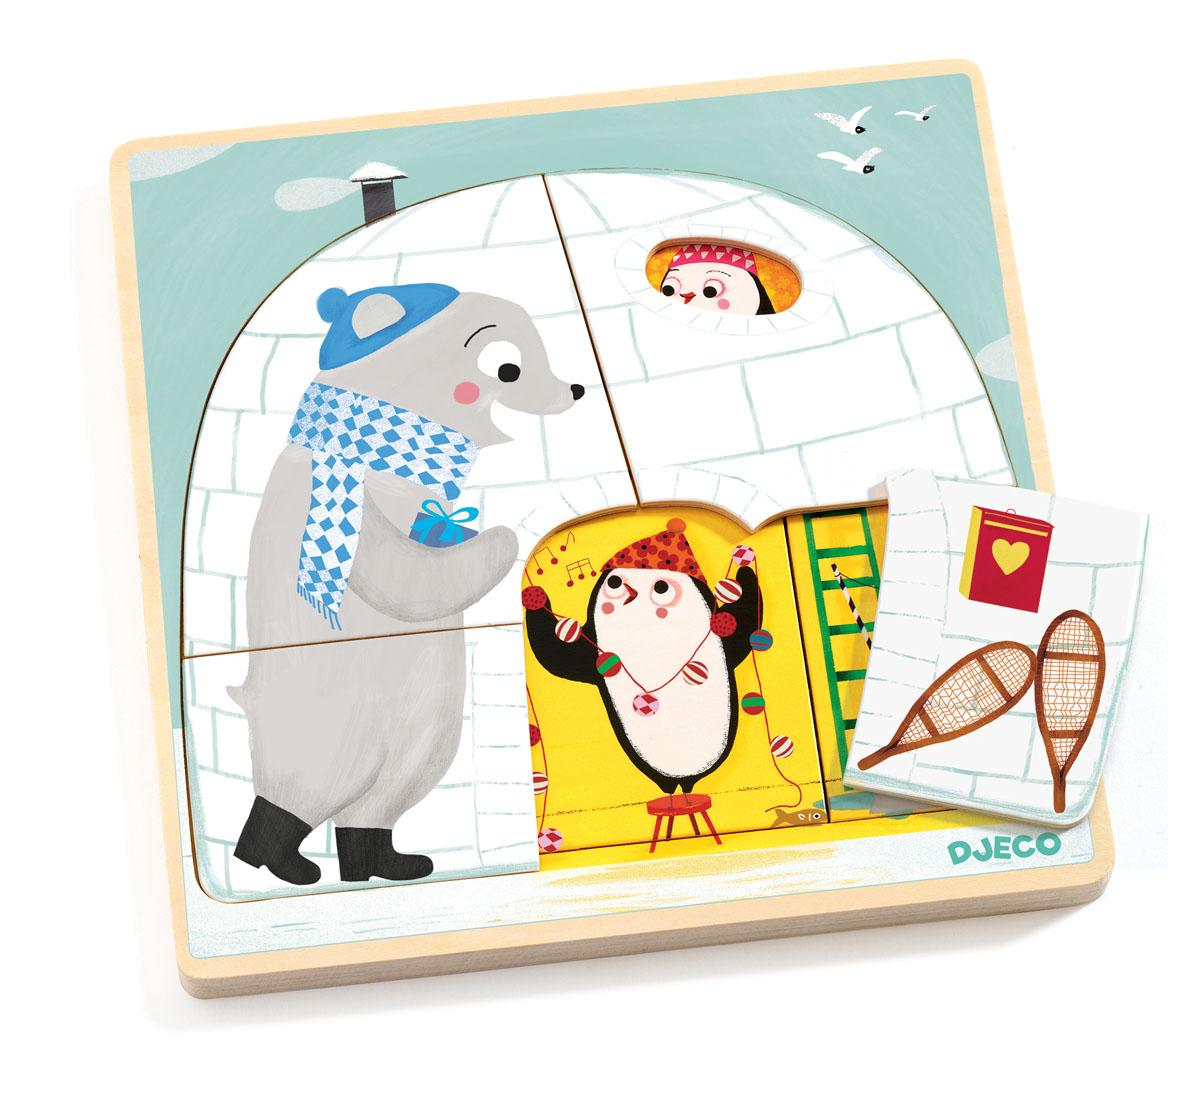 Djeco Пазл для малышей Иглу djeco набор игрушек животные djeco